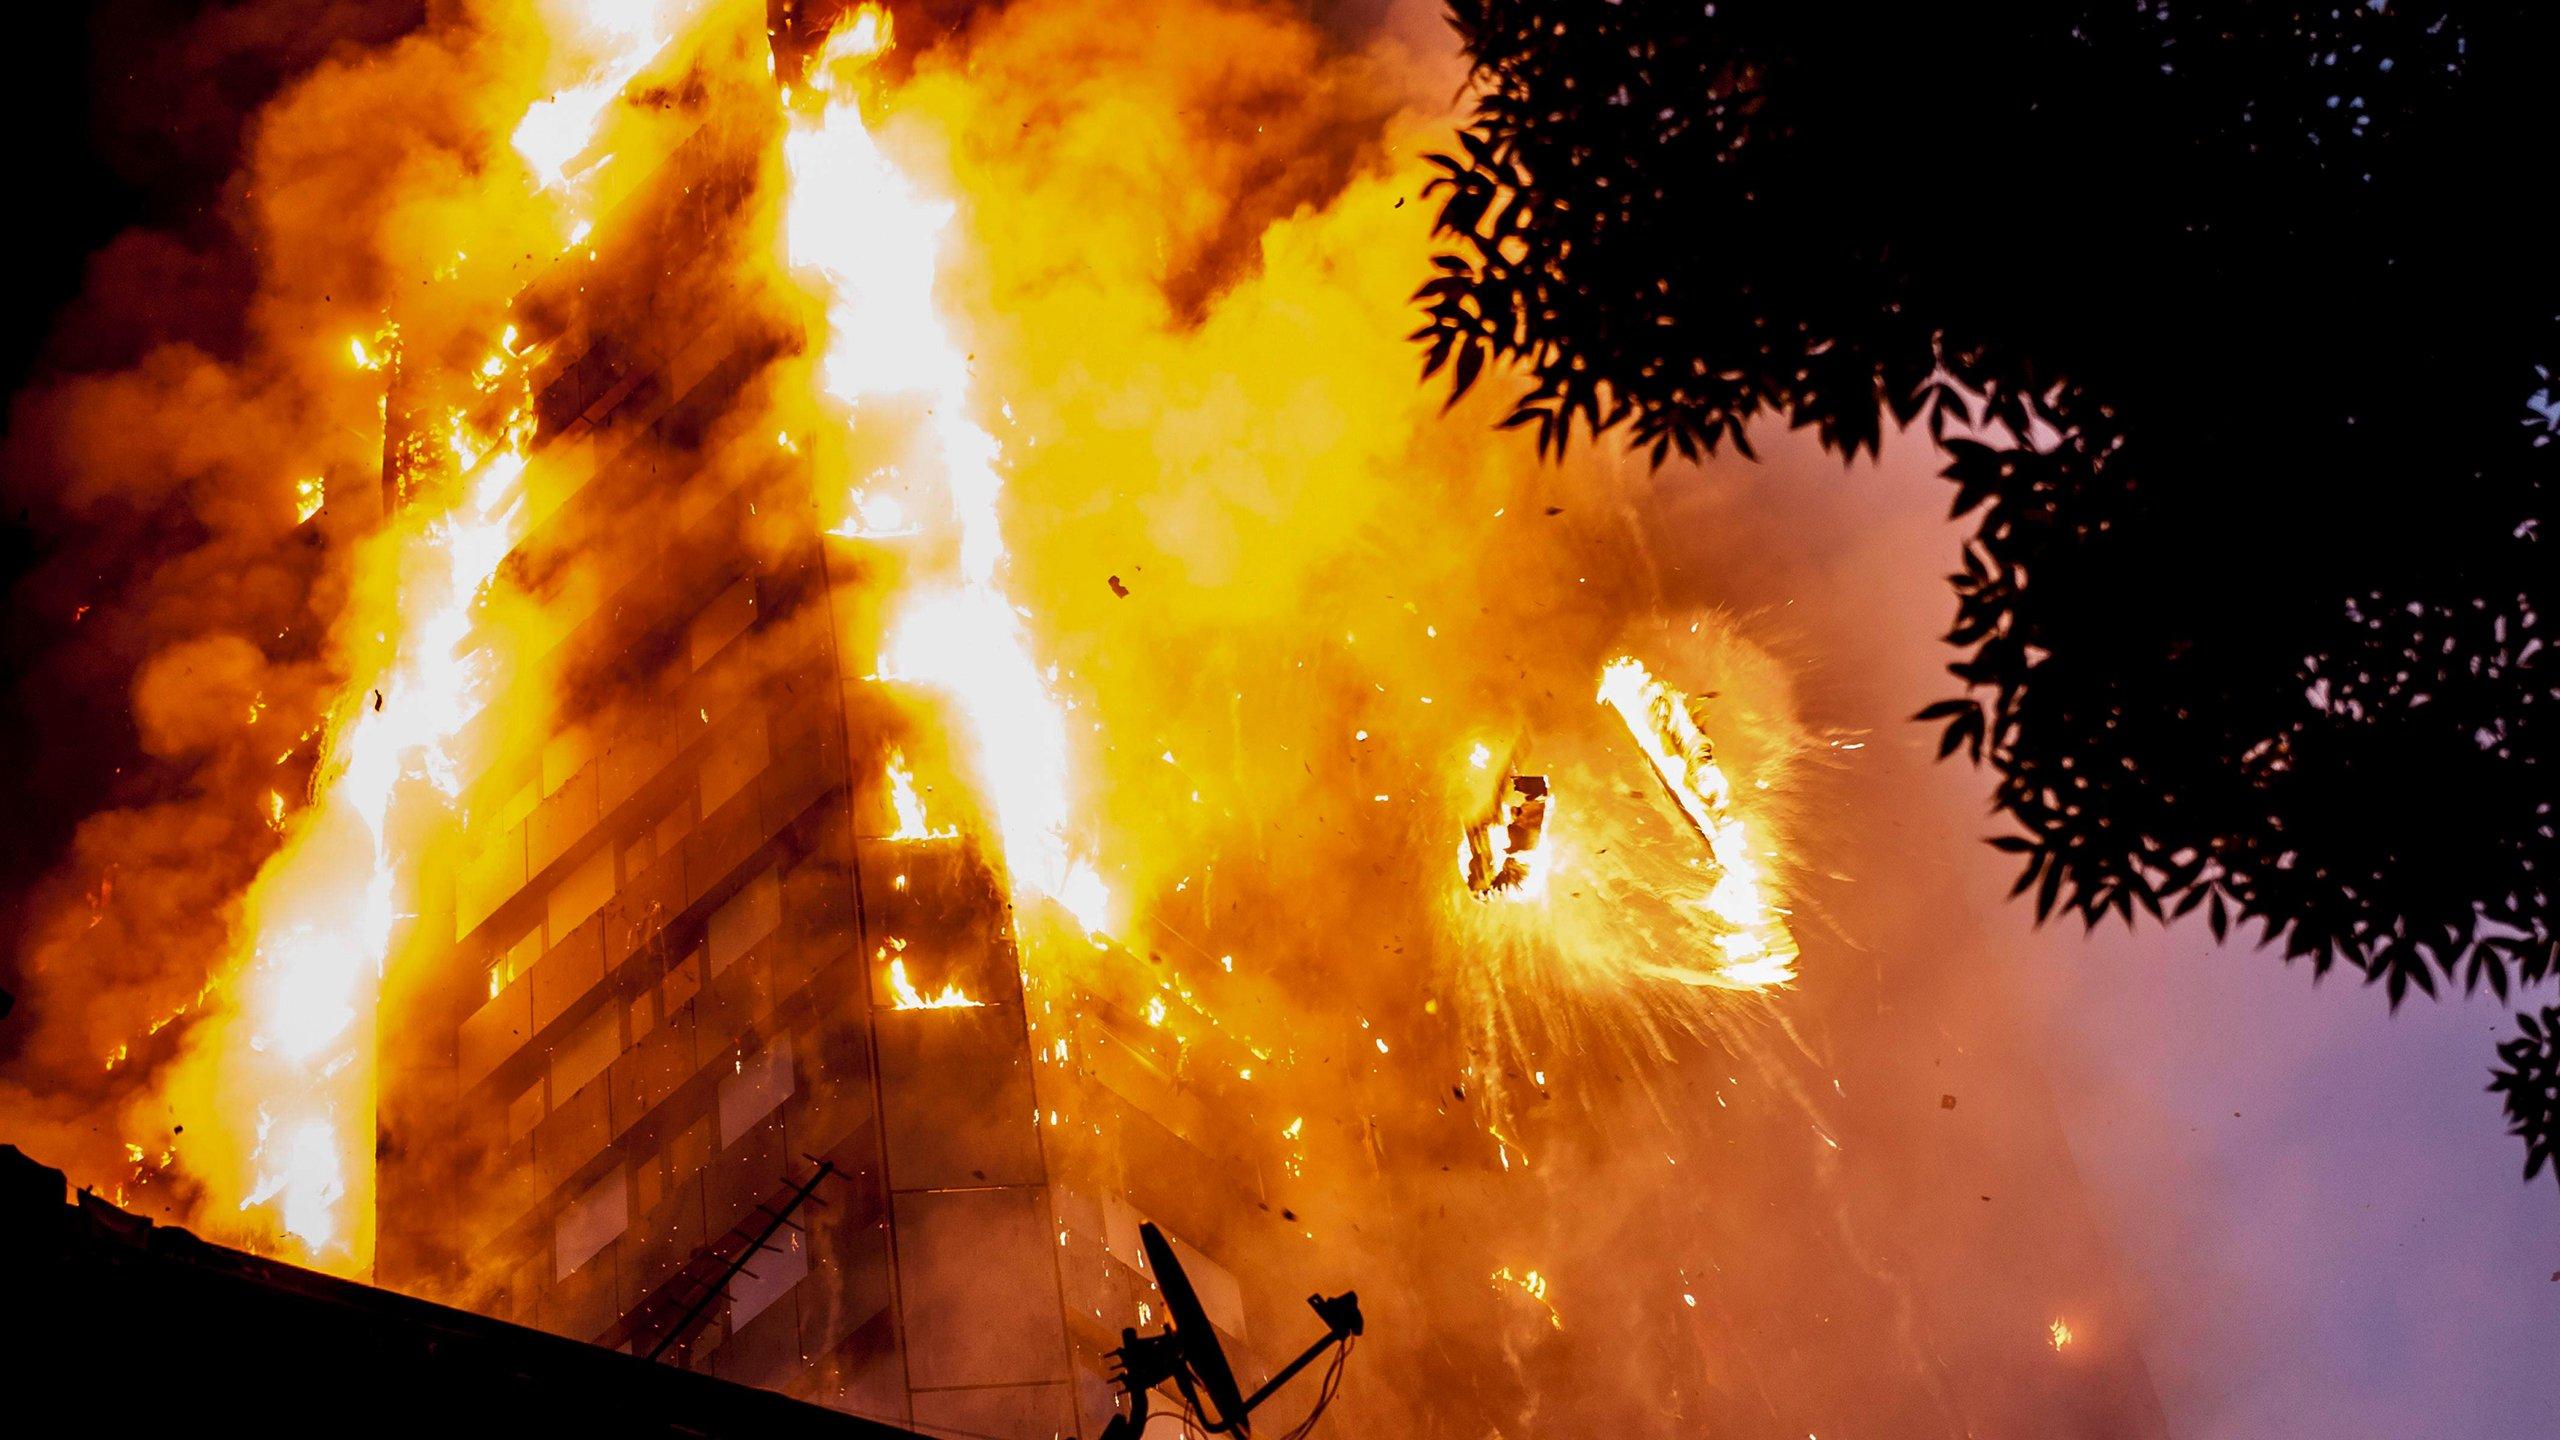 wallpaper 2560x1440 px death fire london night smoke trees